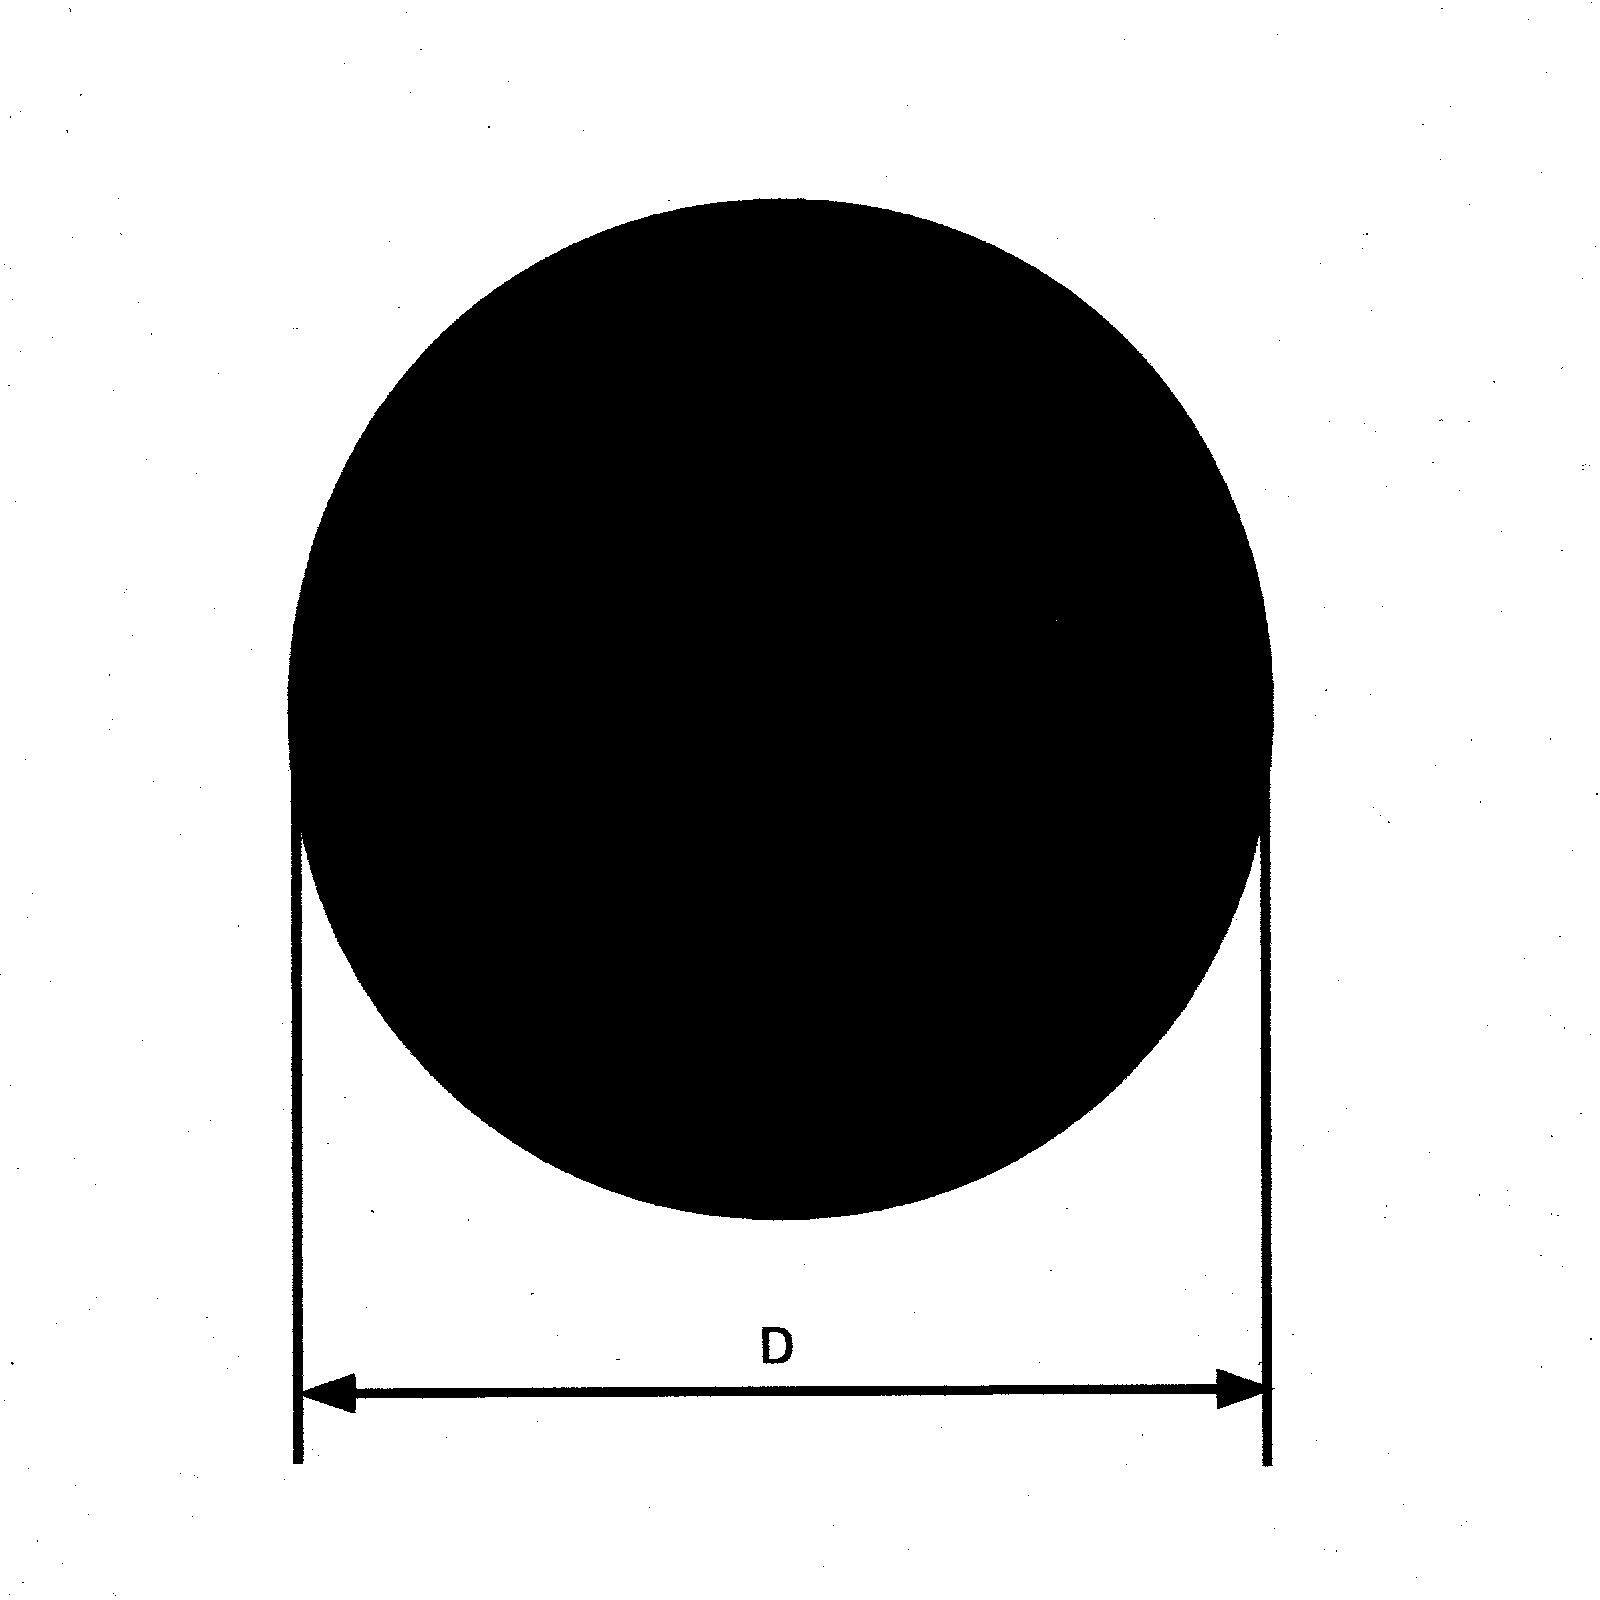 VA Edelstahl Rund Ø 3-40 mm blank/geschl 1.4301 Stab  Stange Rundstahl Welle V2A